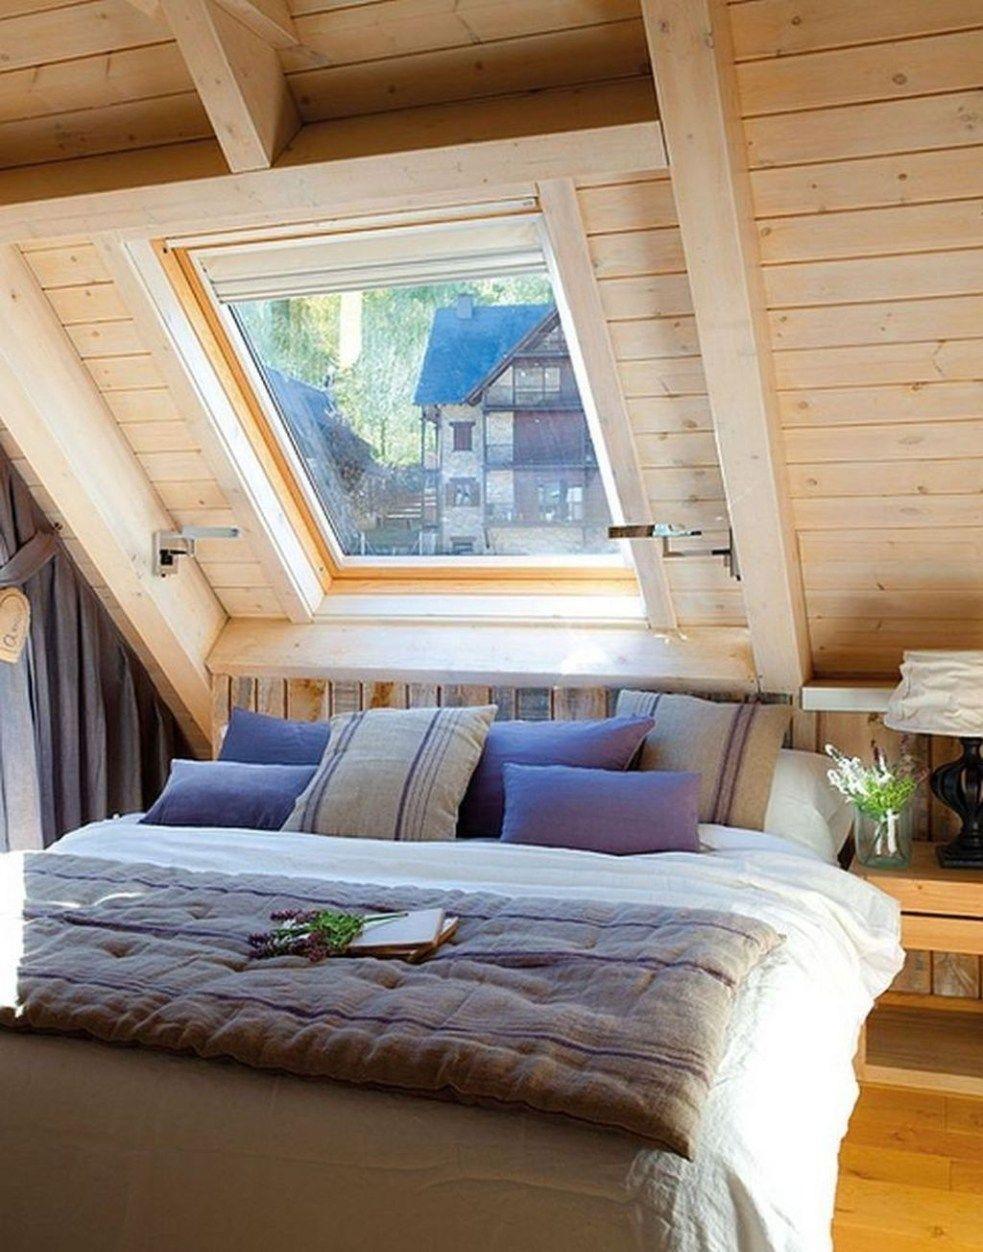 9 Experienced Tips Attic Living Space Cozy Attic Reading Attic Door Ladder Attic Space Articles Attic Attic Bedroom Small Attic Bedroom Designs Attic Bedroom